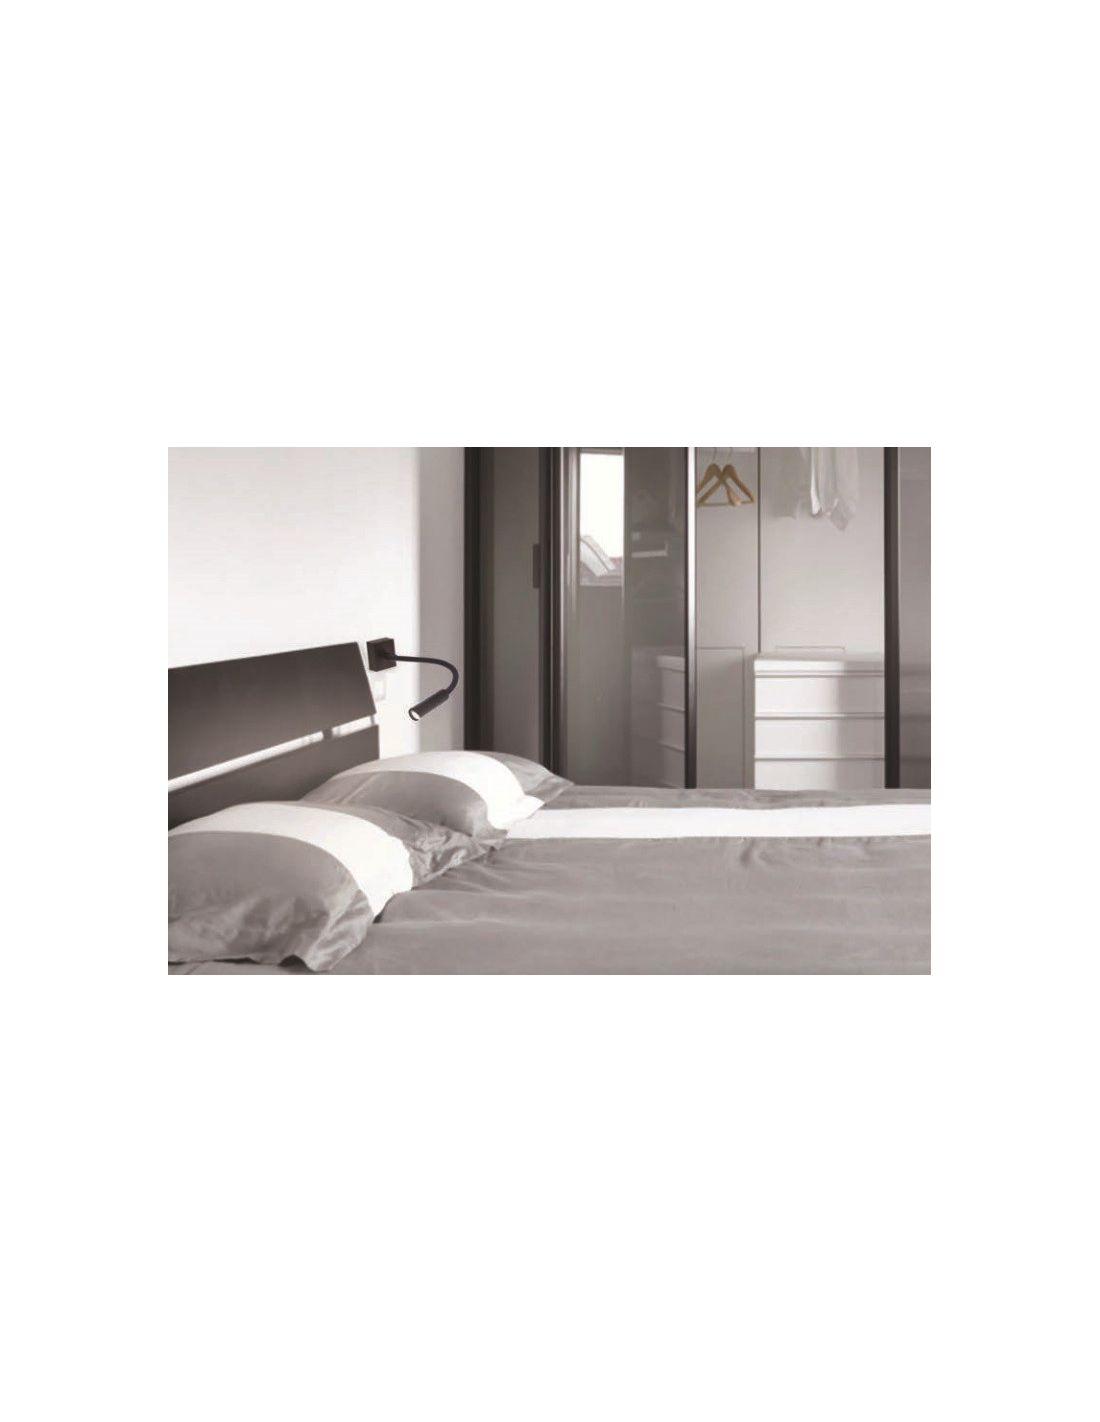 Apliques para cabecero de cama con flexo env o r pido y for Cabeceros de cama zaragoza